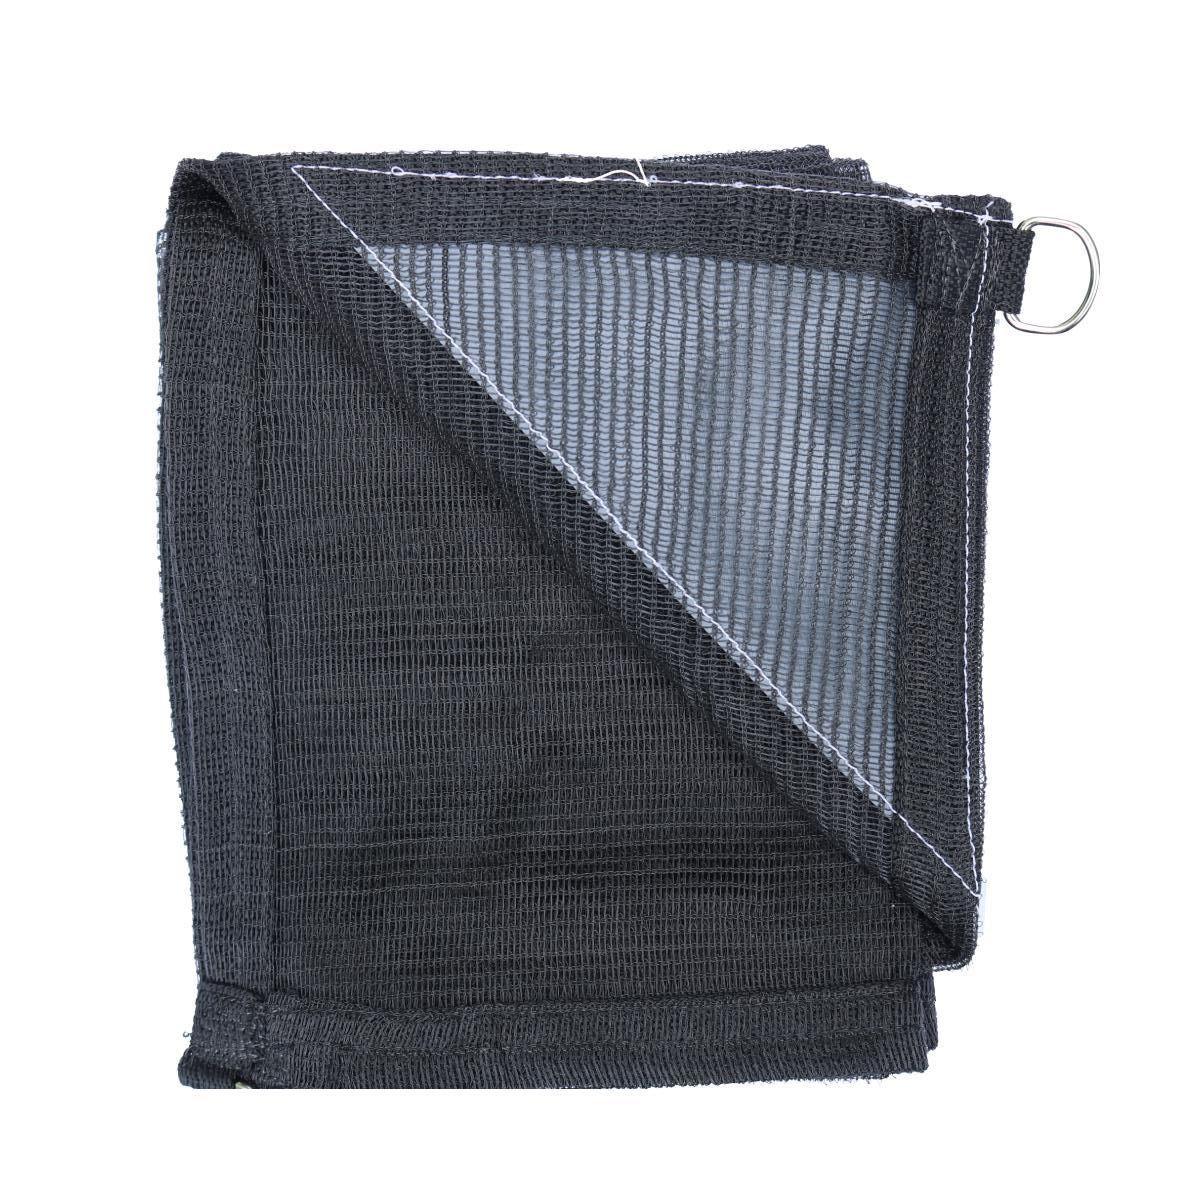 Sombrite 70 Multi Proteção 5m x 1,5m